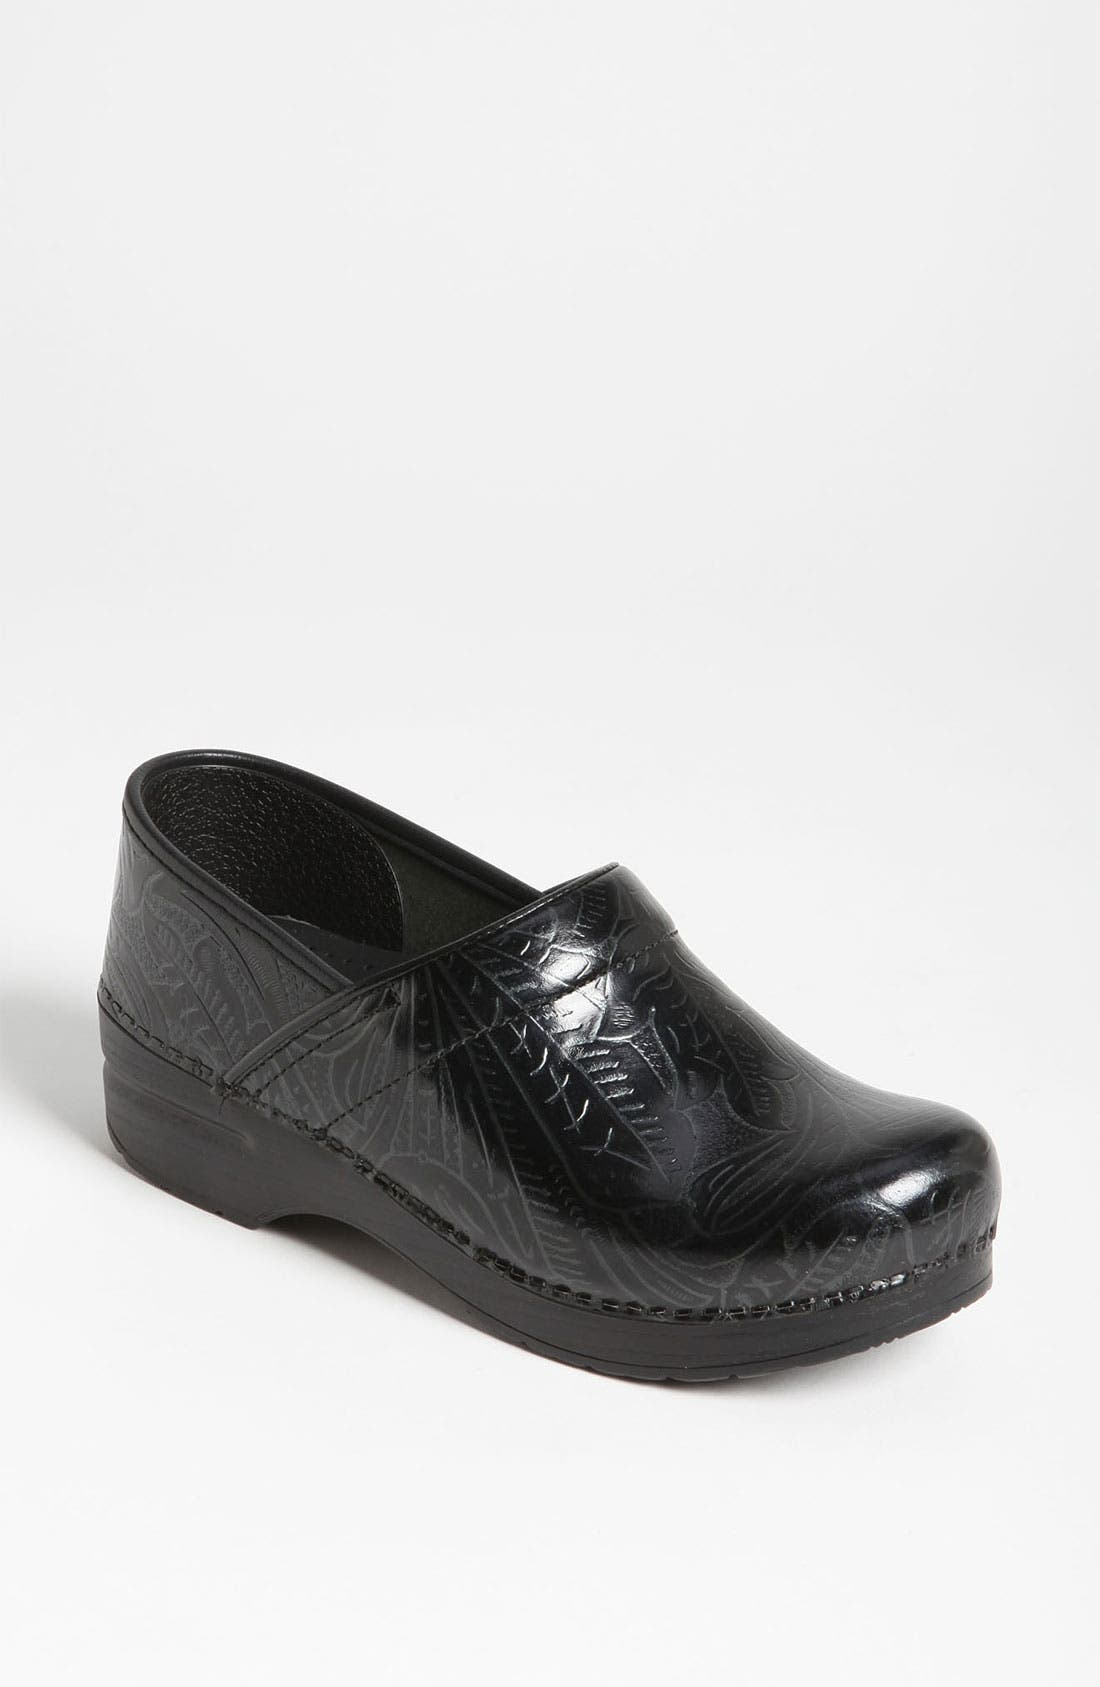 'Professional Tooled' Clog,                         Main,                         color, BLACK TOOLED